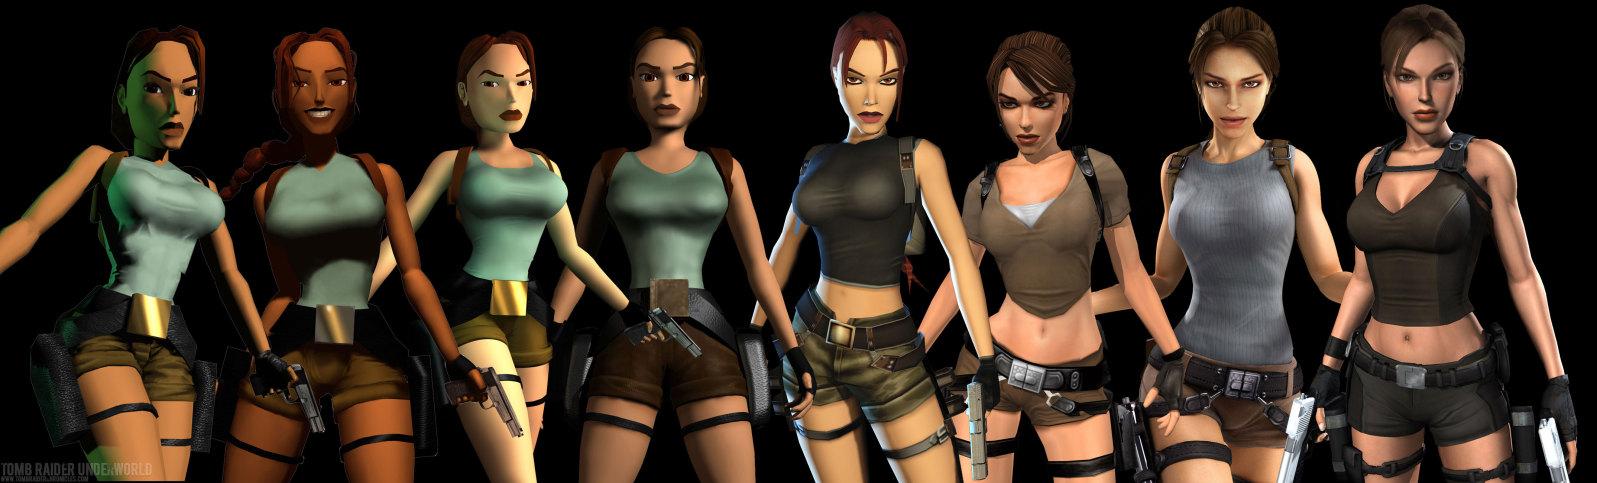 Many Changes of Lara Croft